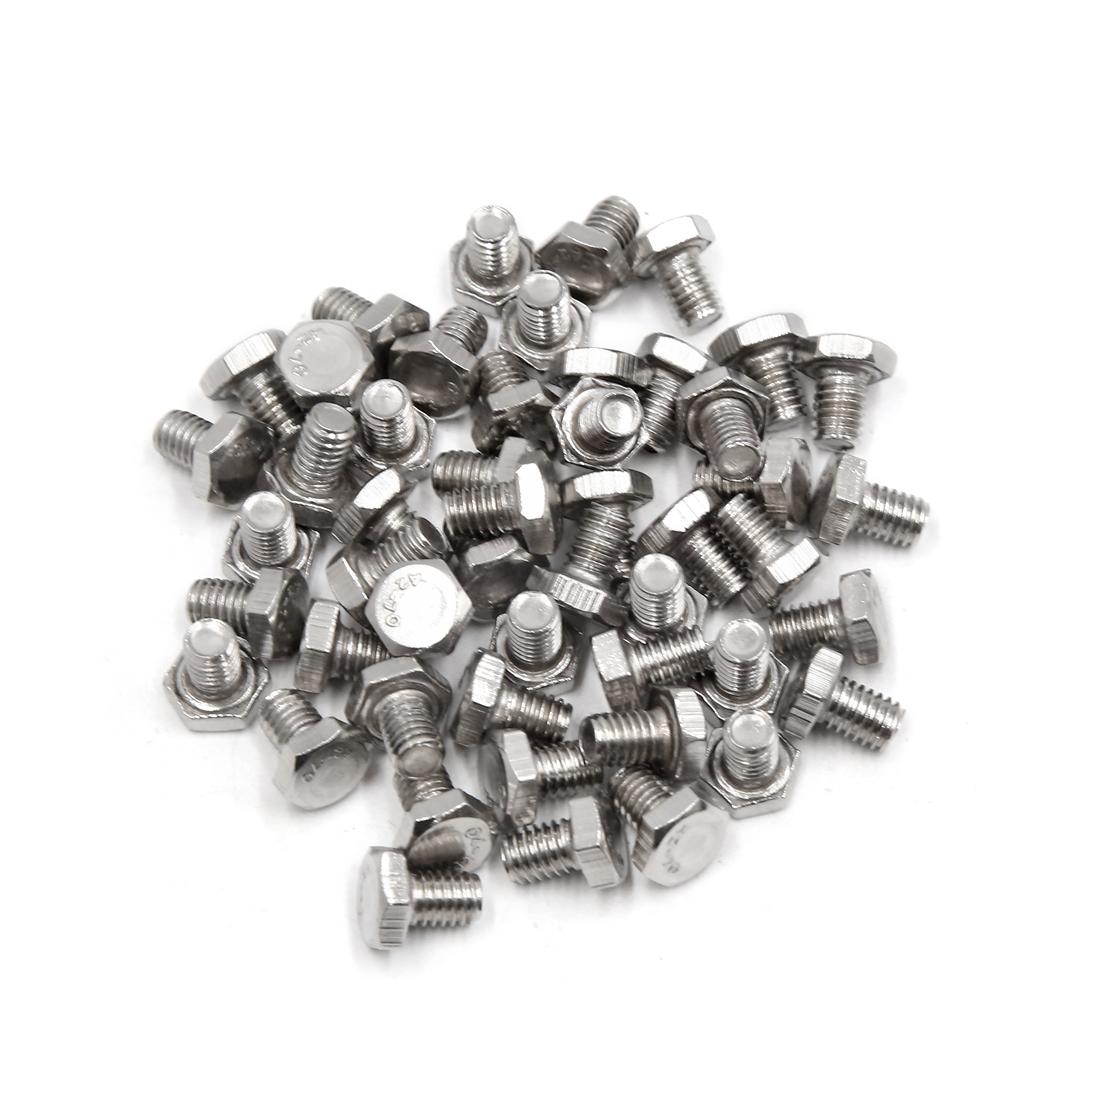 50Pcs M6 x 8mm 304 Stainless Steel Motorcycle Hex Socket Head Cap Screws Bolts